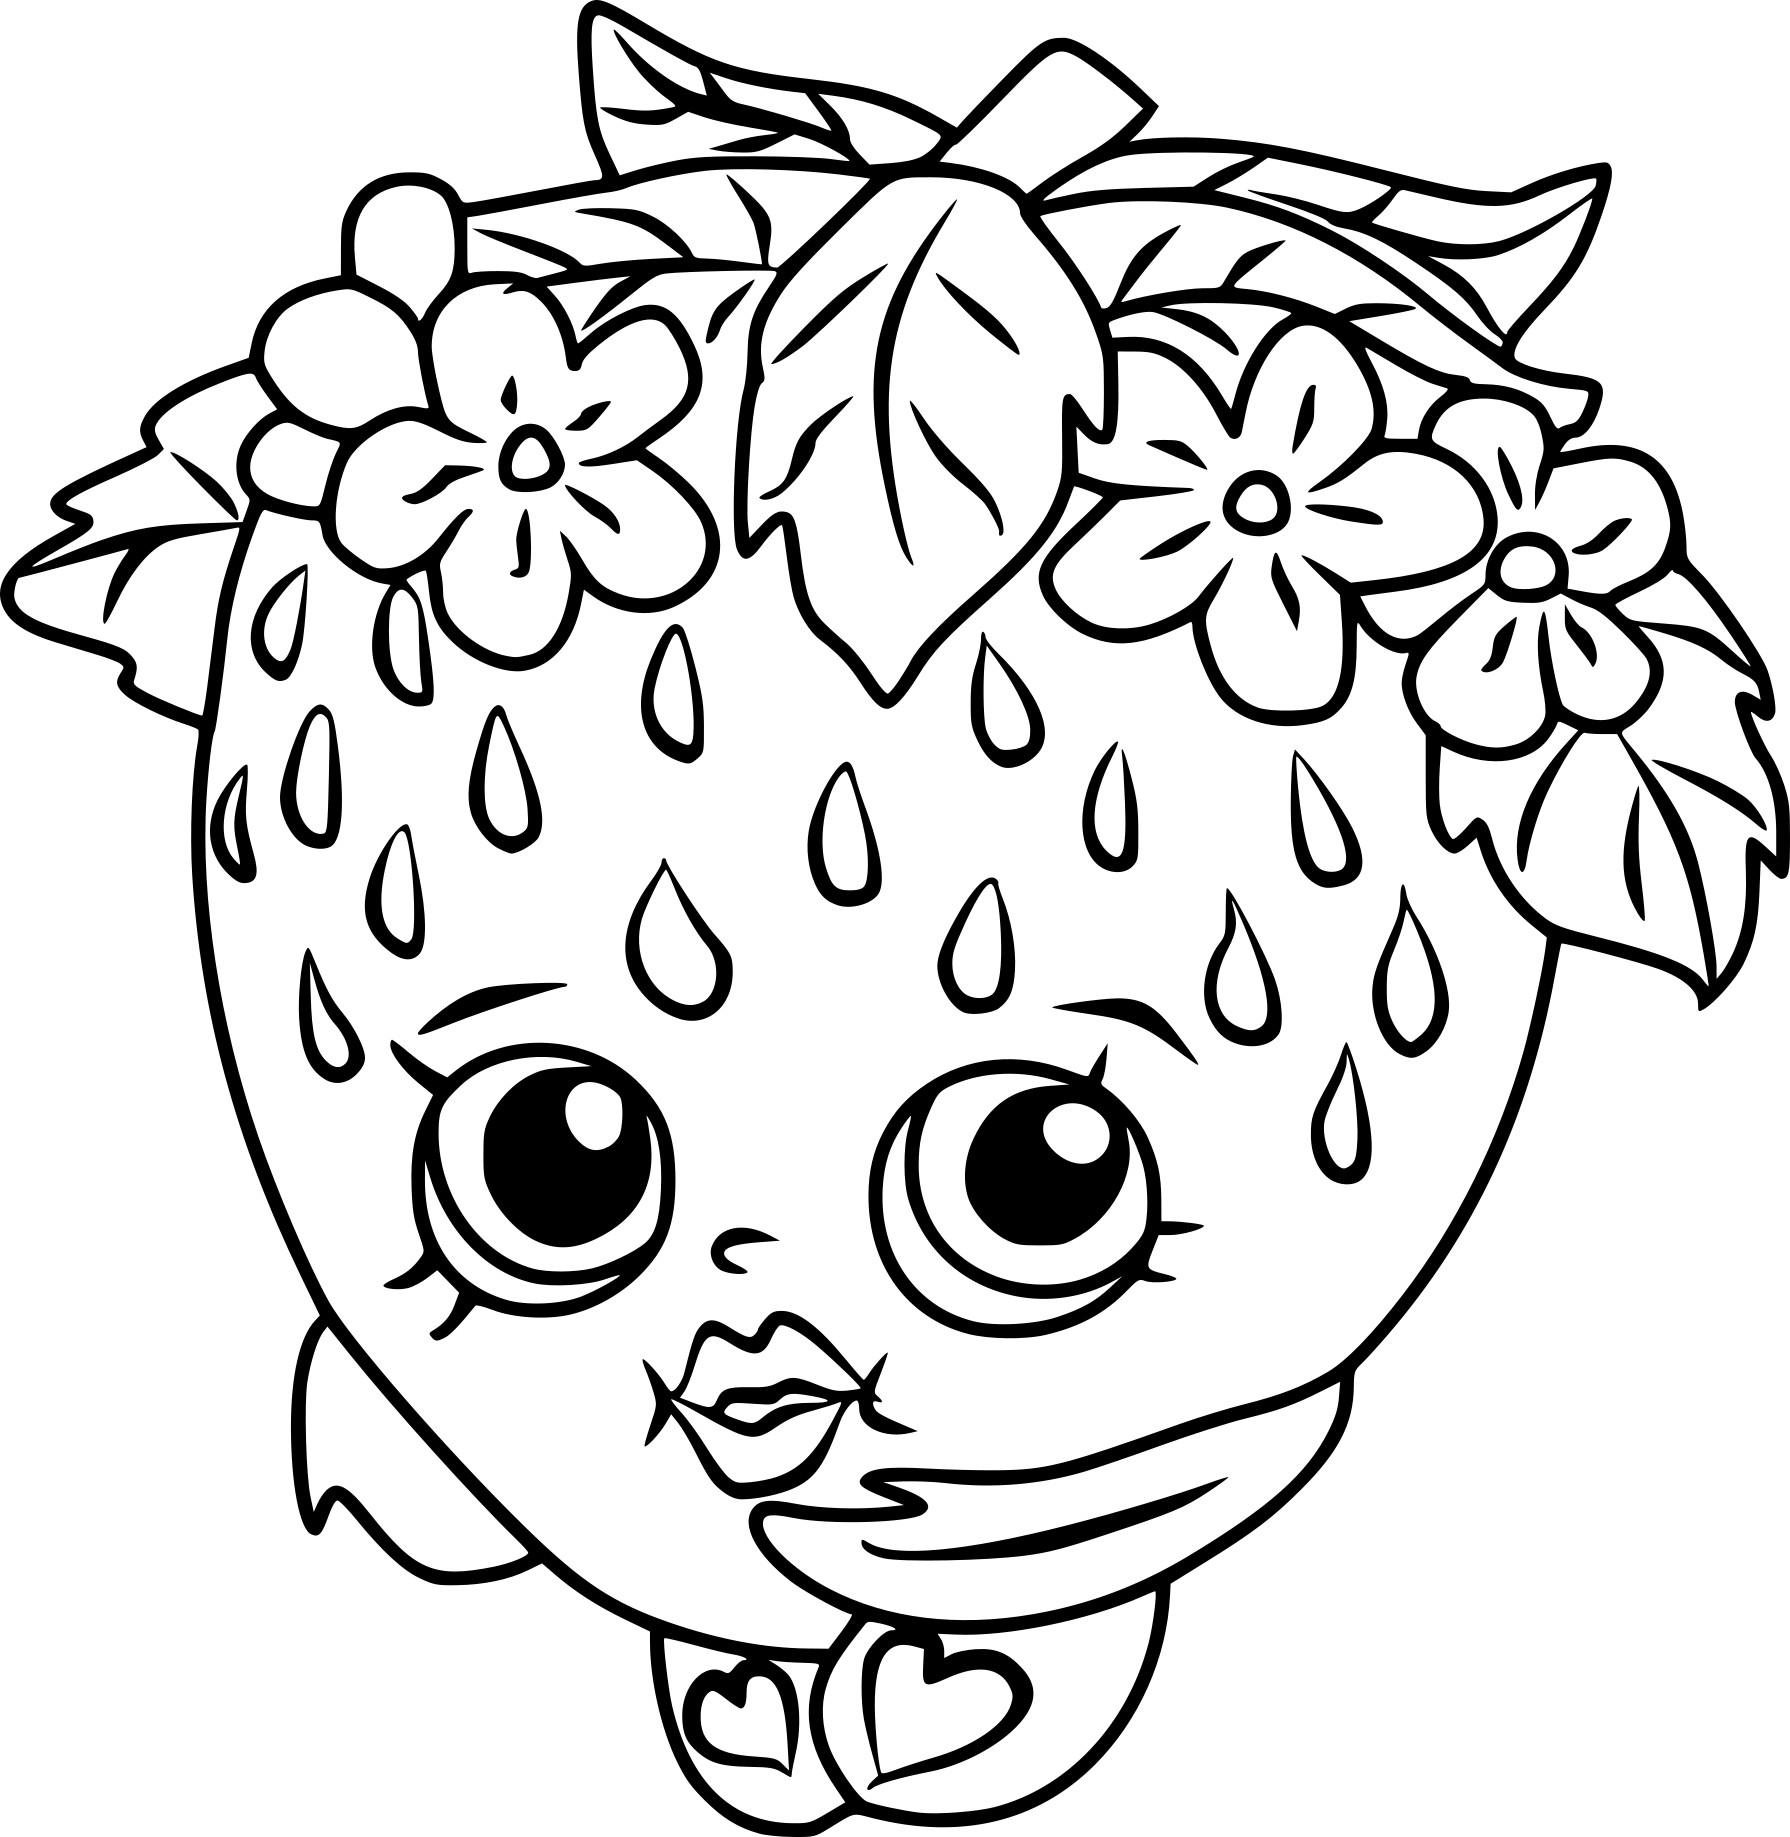 Strawberry Shopkin Coloring Page